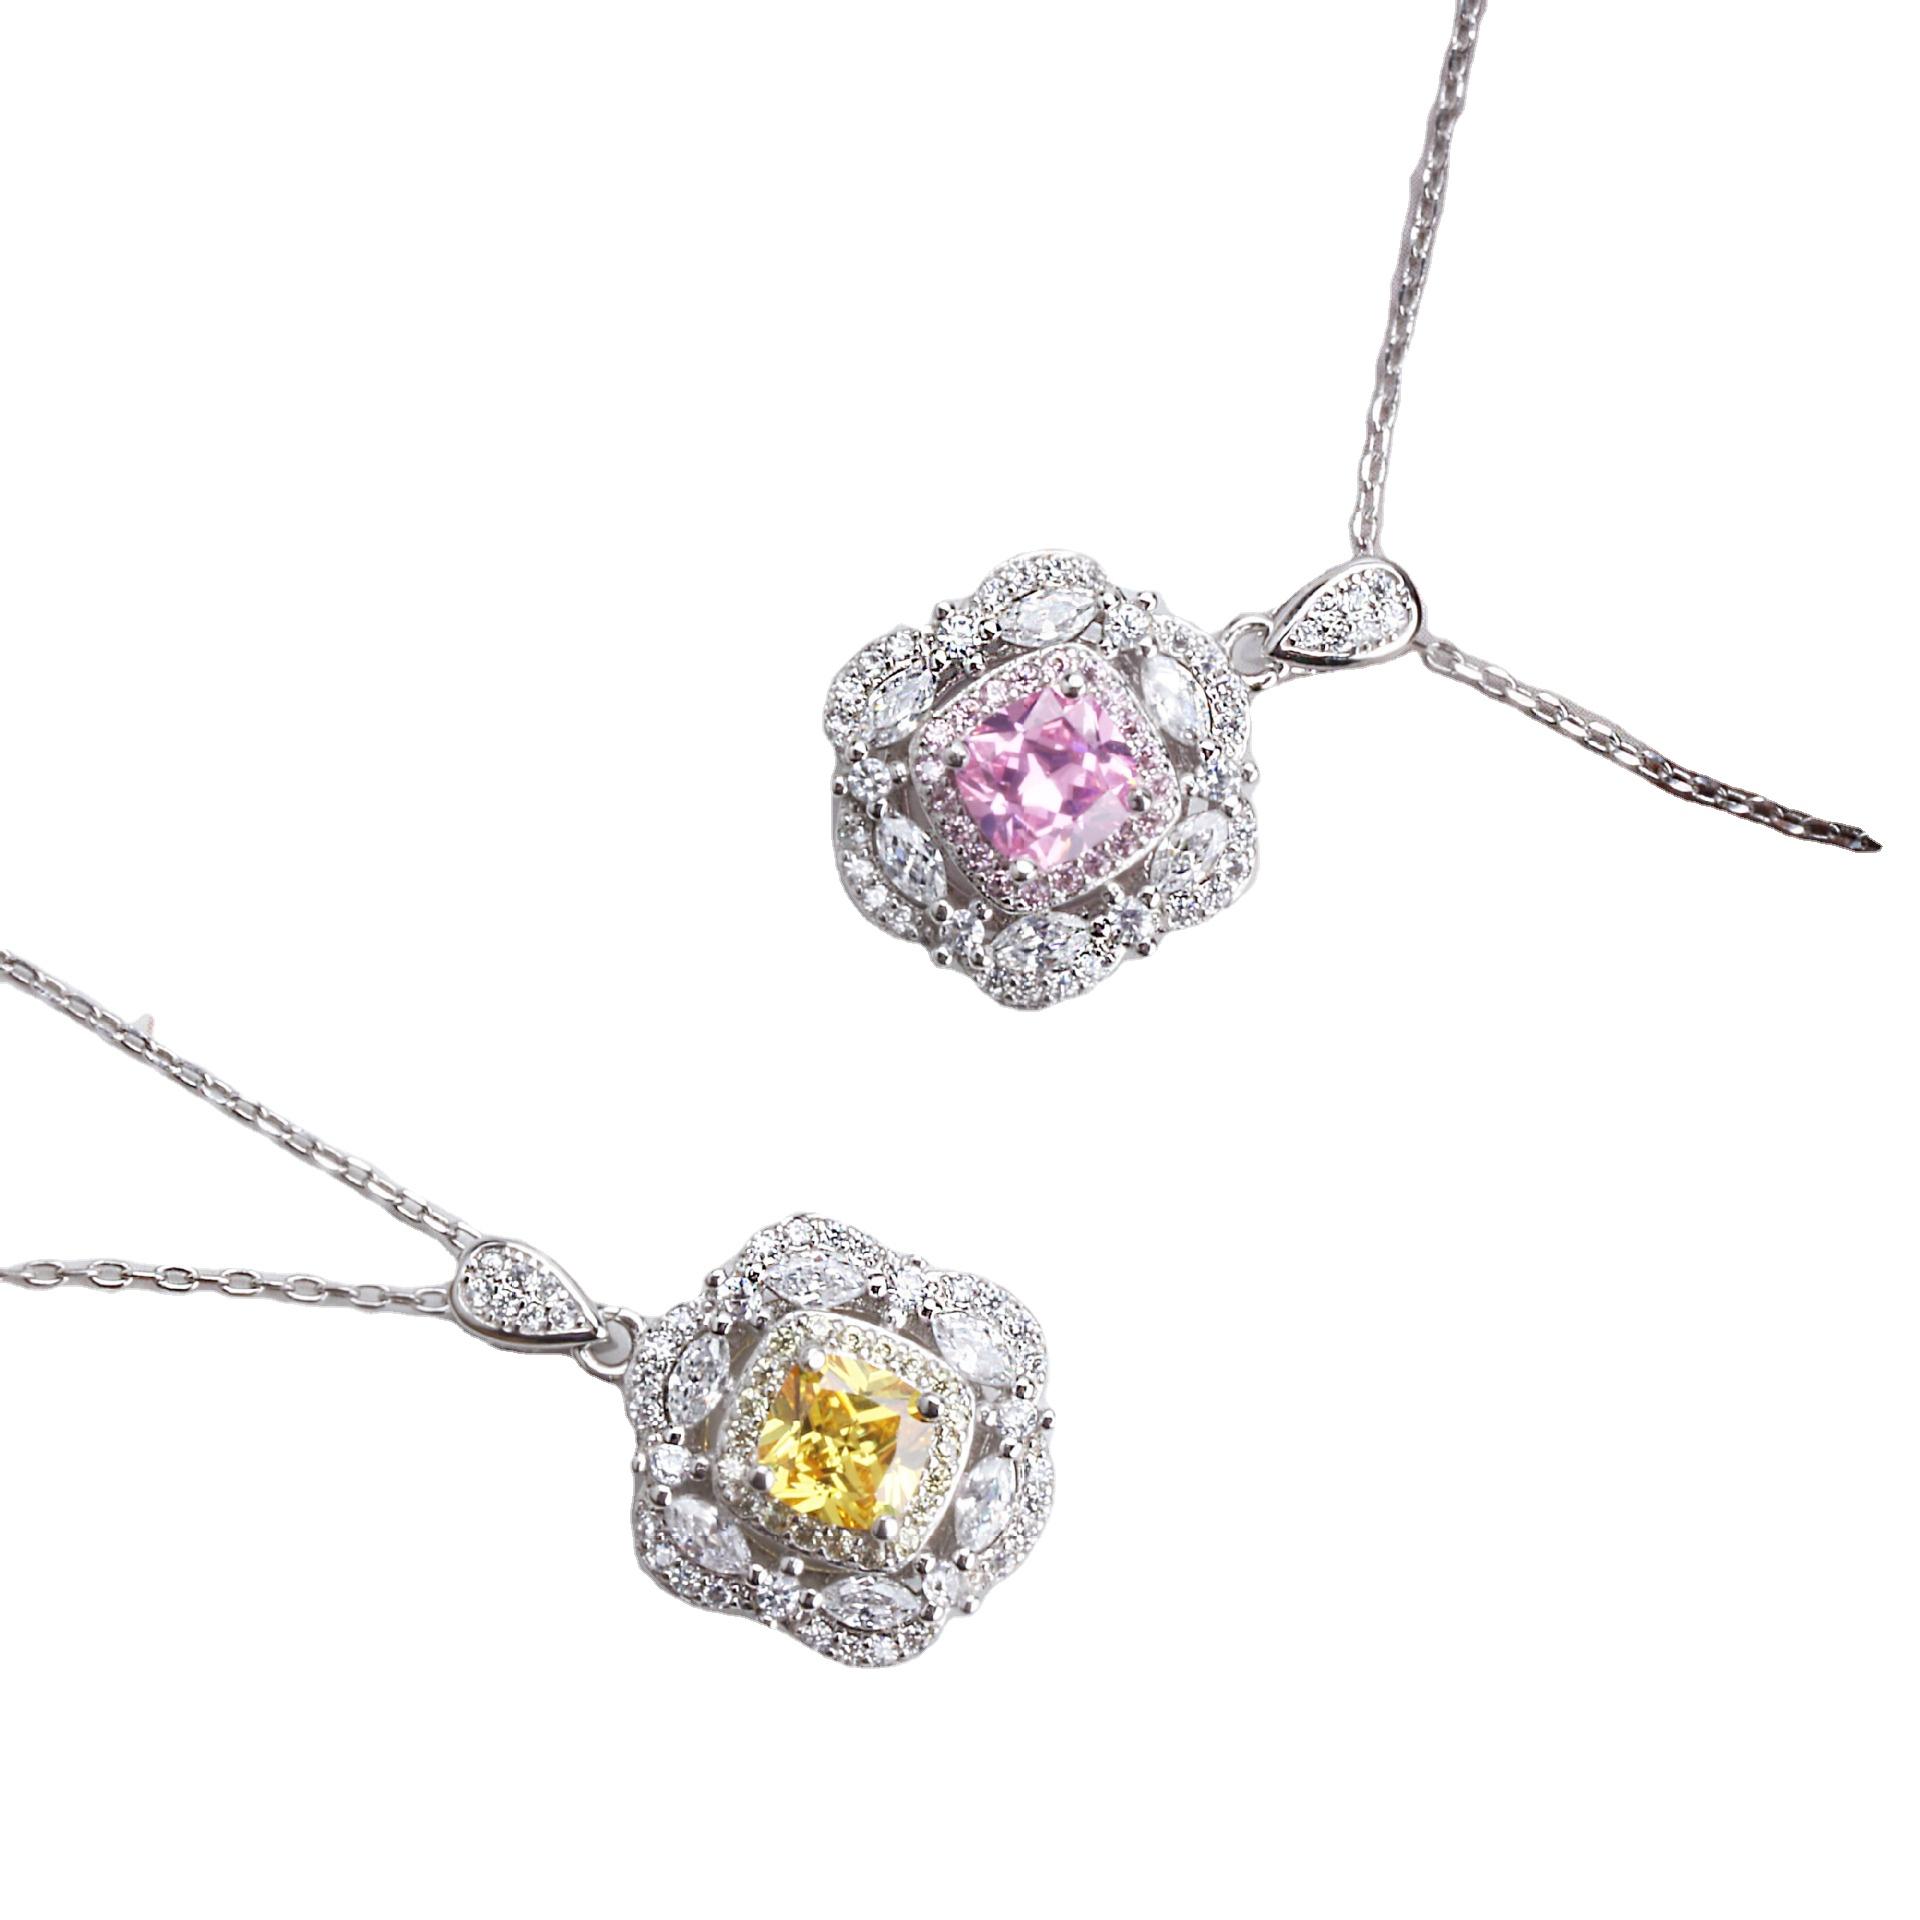 Silver Color Jewelry Necklace Diamond